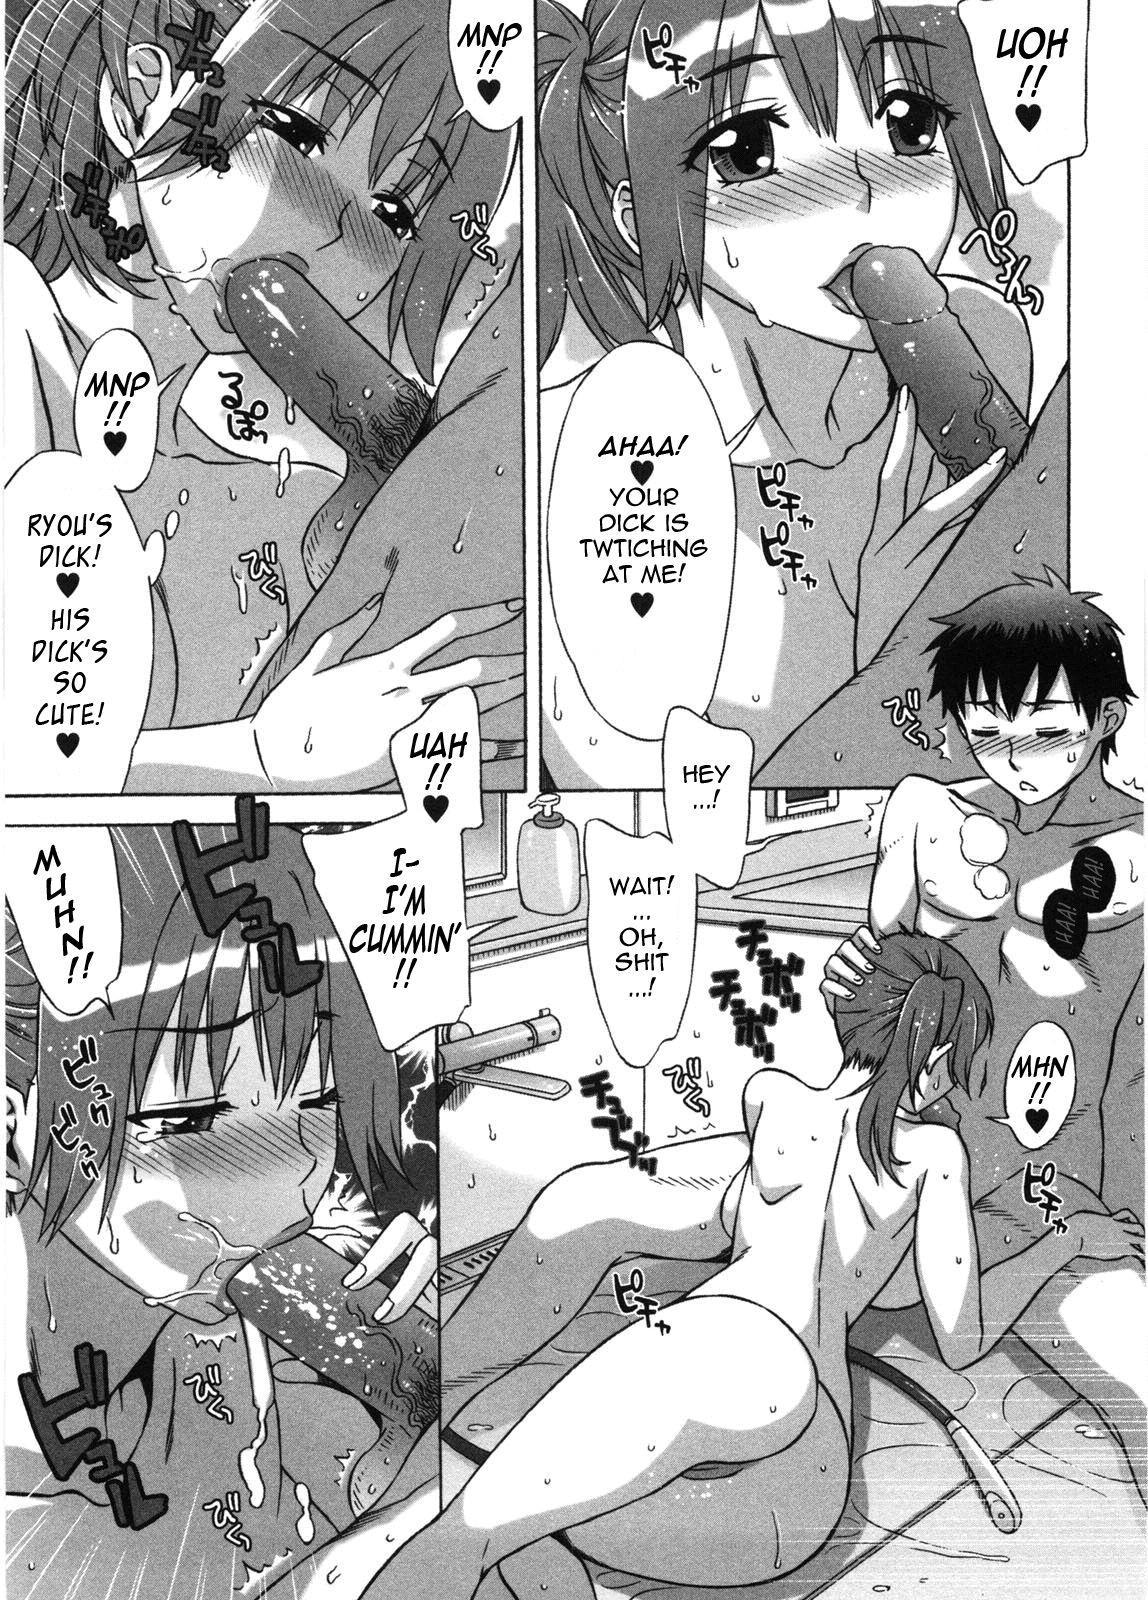 [Hanzaki Jirou] Ama Ero - Sweet Sugar Baby Ch. 1-7 [English] [Tadanohito] [Decensored] 99